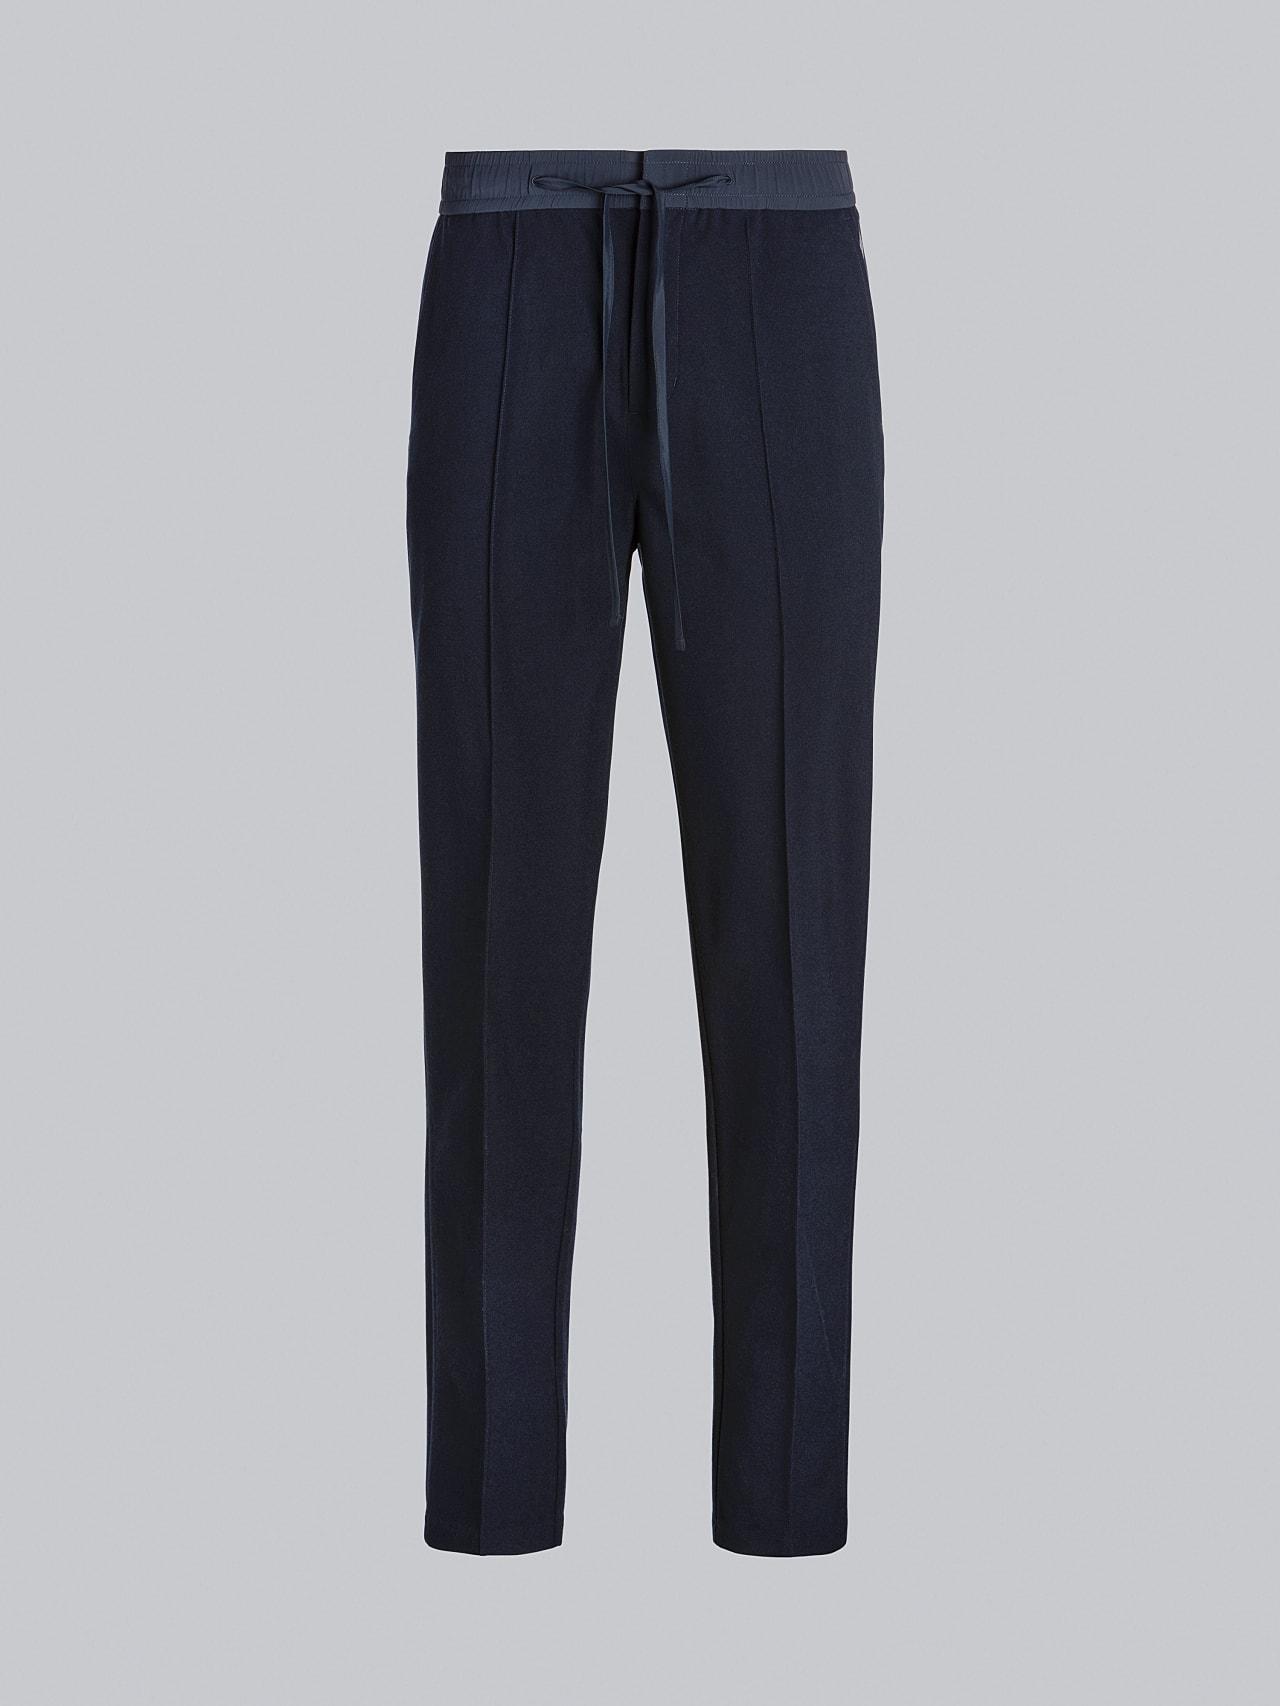 PANZA V1.Y5.02 Slim Pleat Trousers navy Back Alpha Tauri